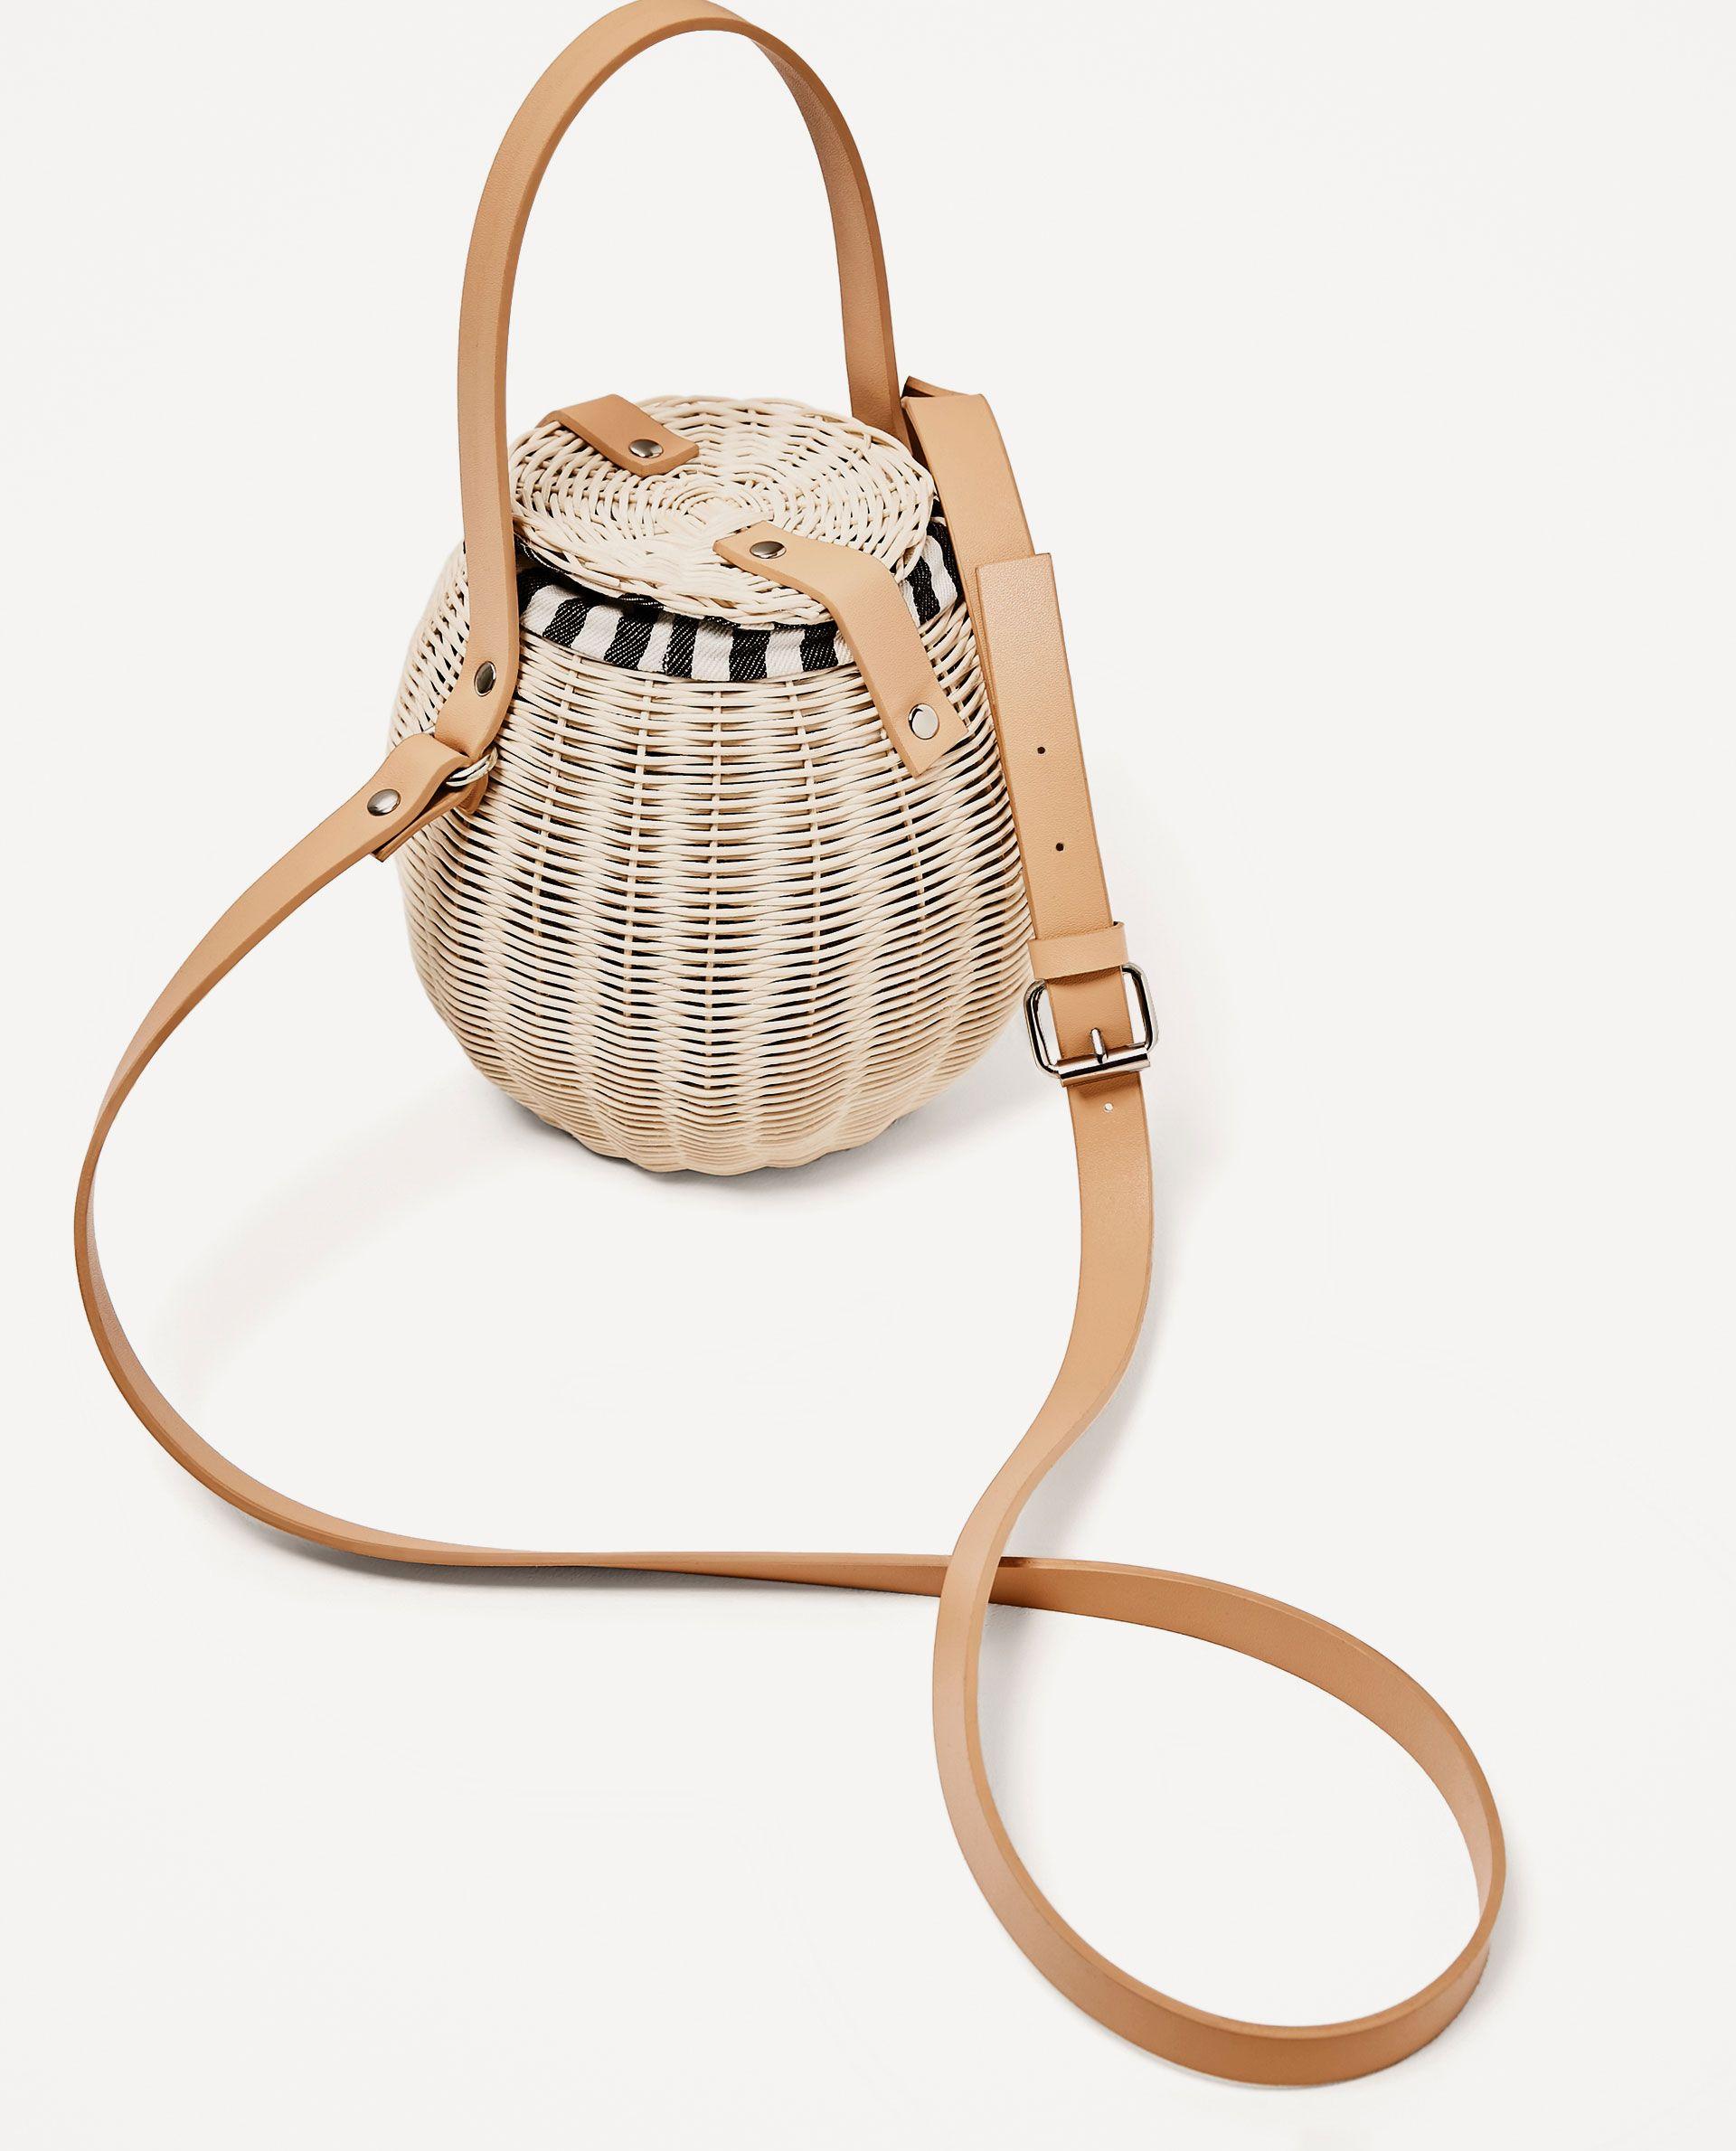 08482fb7c81 Image 3 of RAFFIA BUCKET BAG from Zara Vime